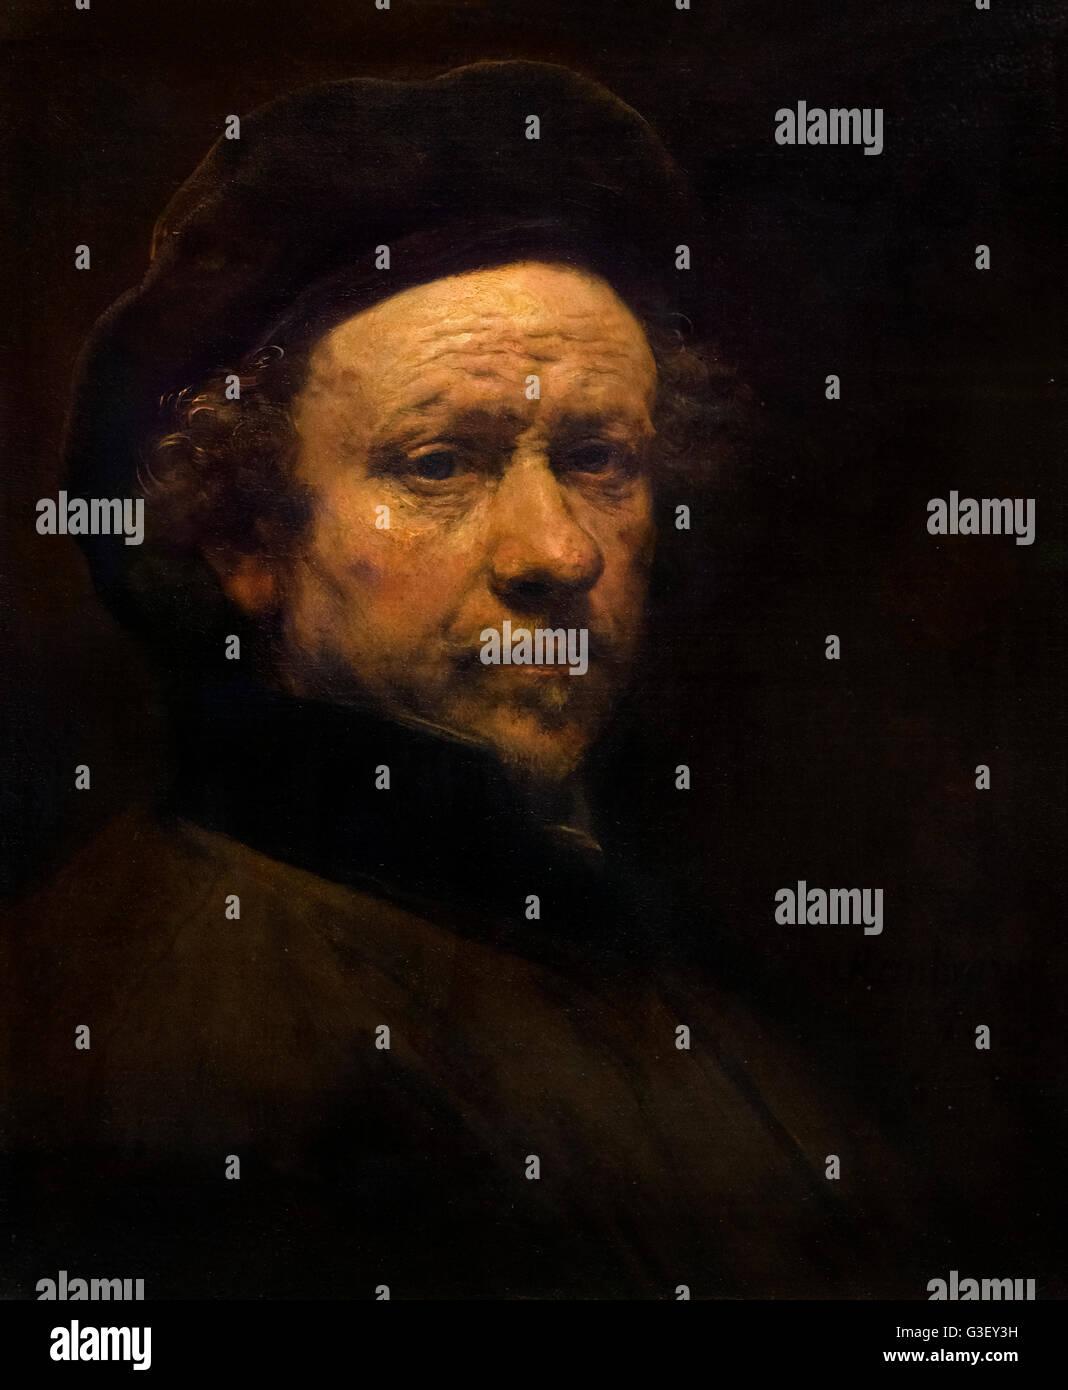 Rembrandt, Self-Portrait, Aged 51, oil on canvas, c.1657 - Stock Image